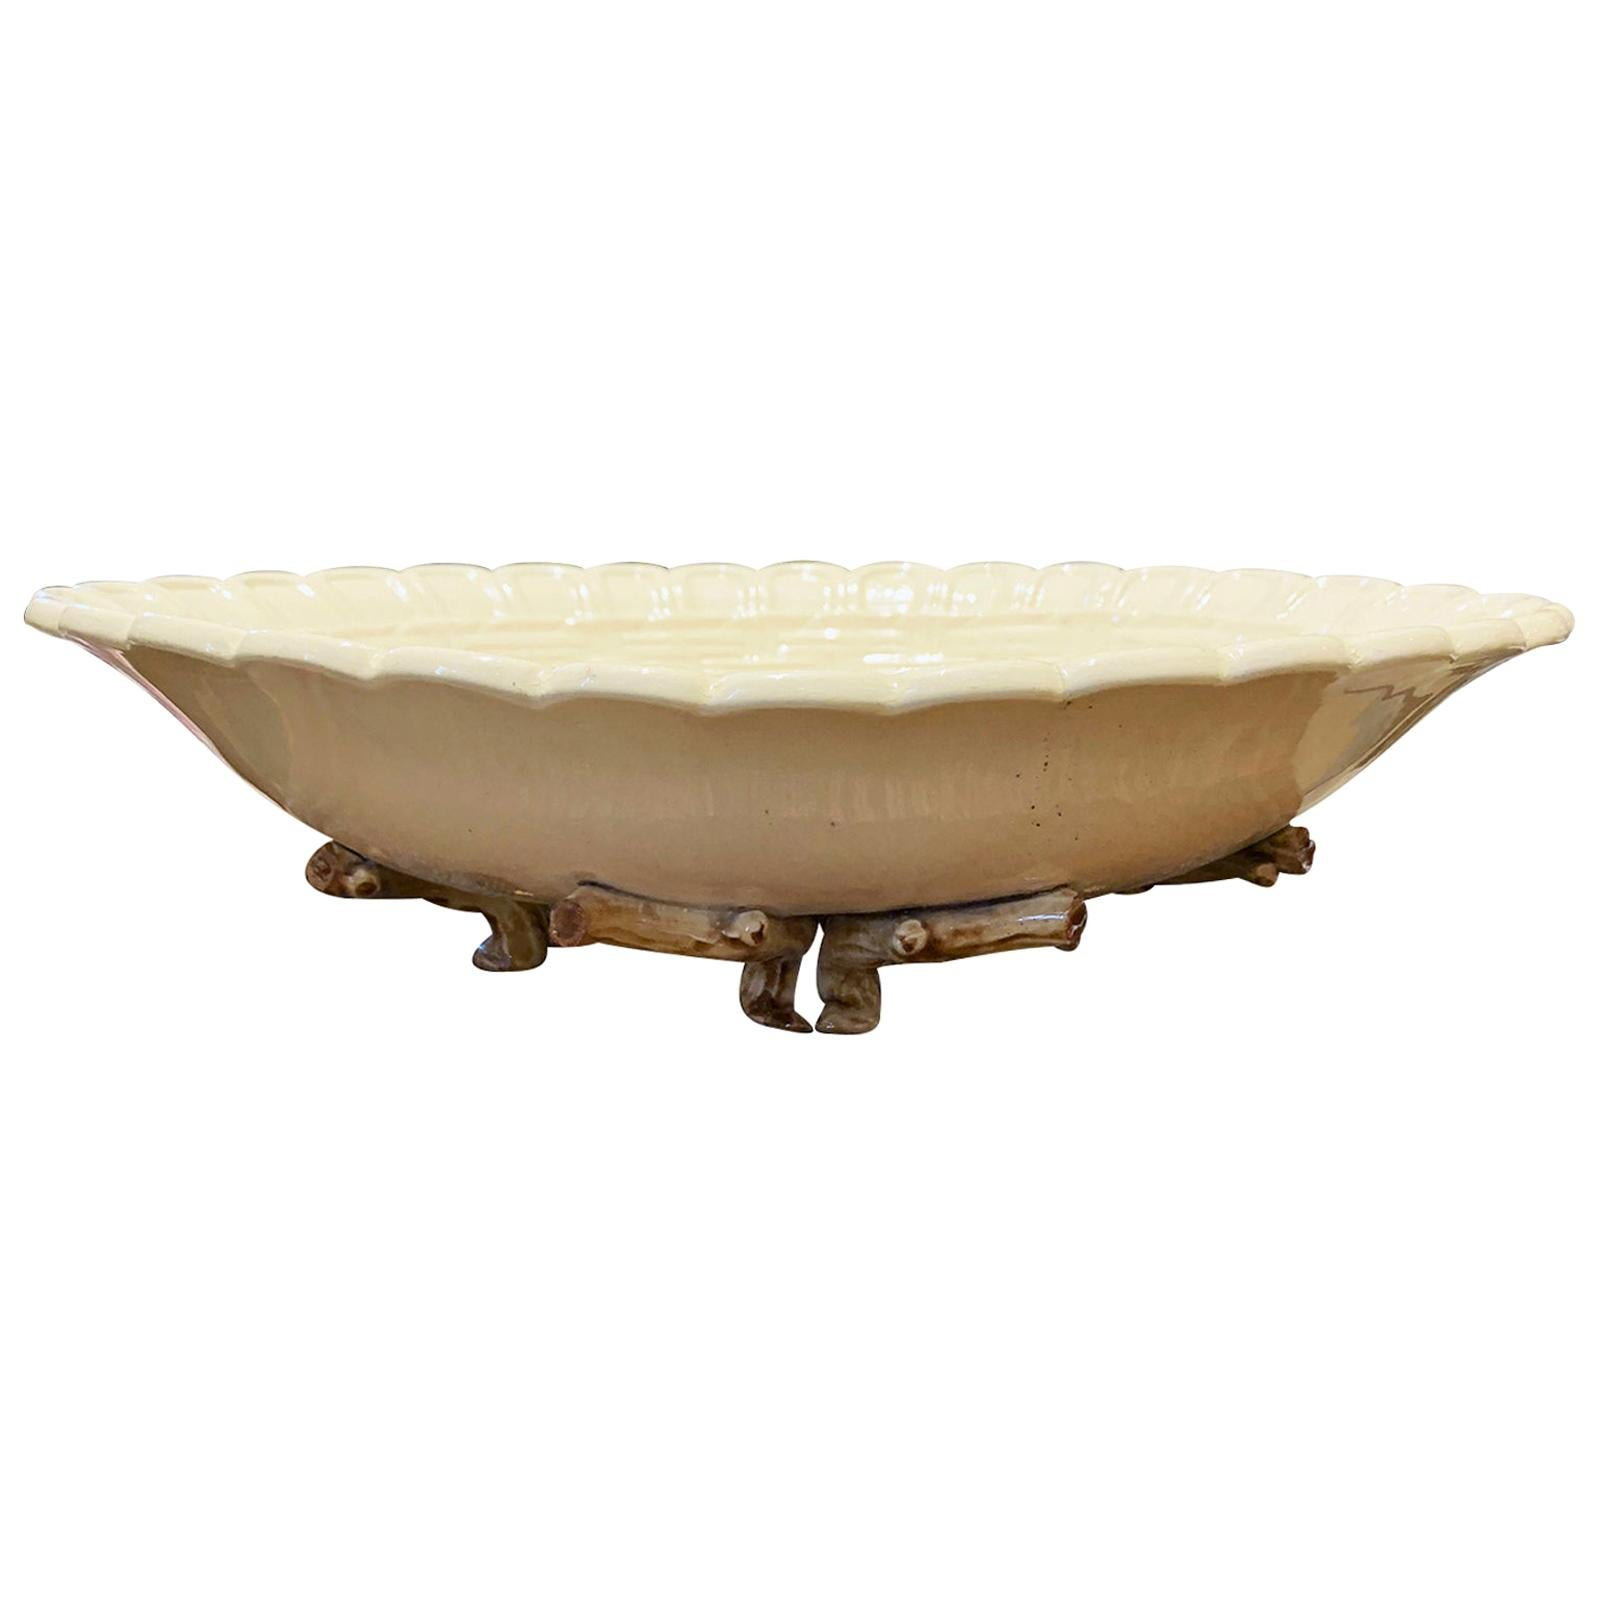 19th Century Majolica Fruit Bowl